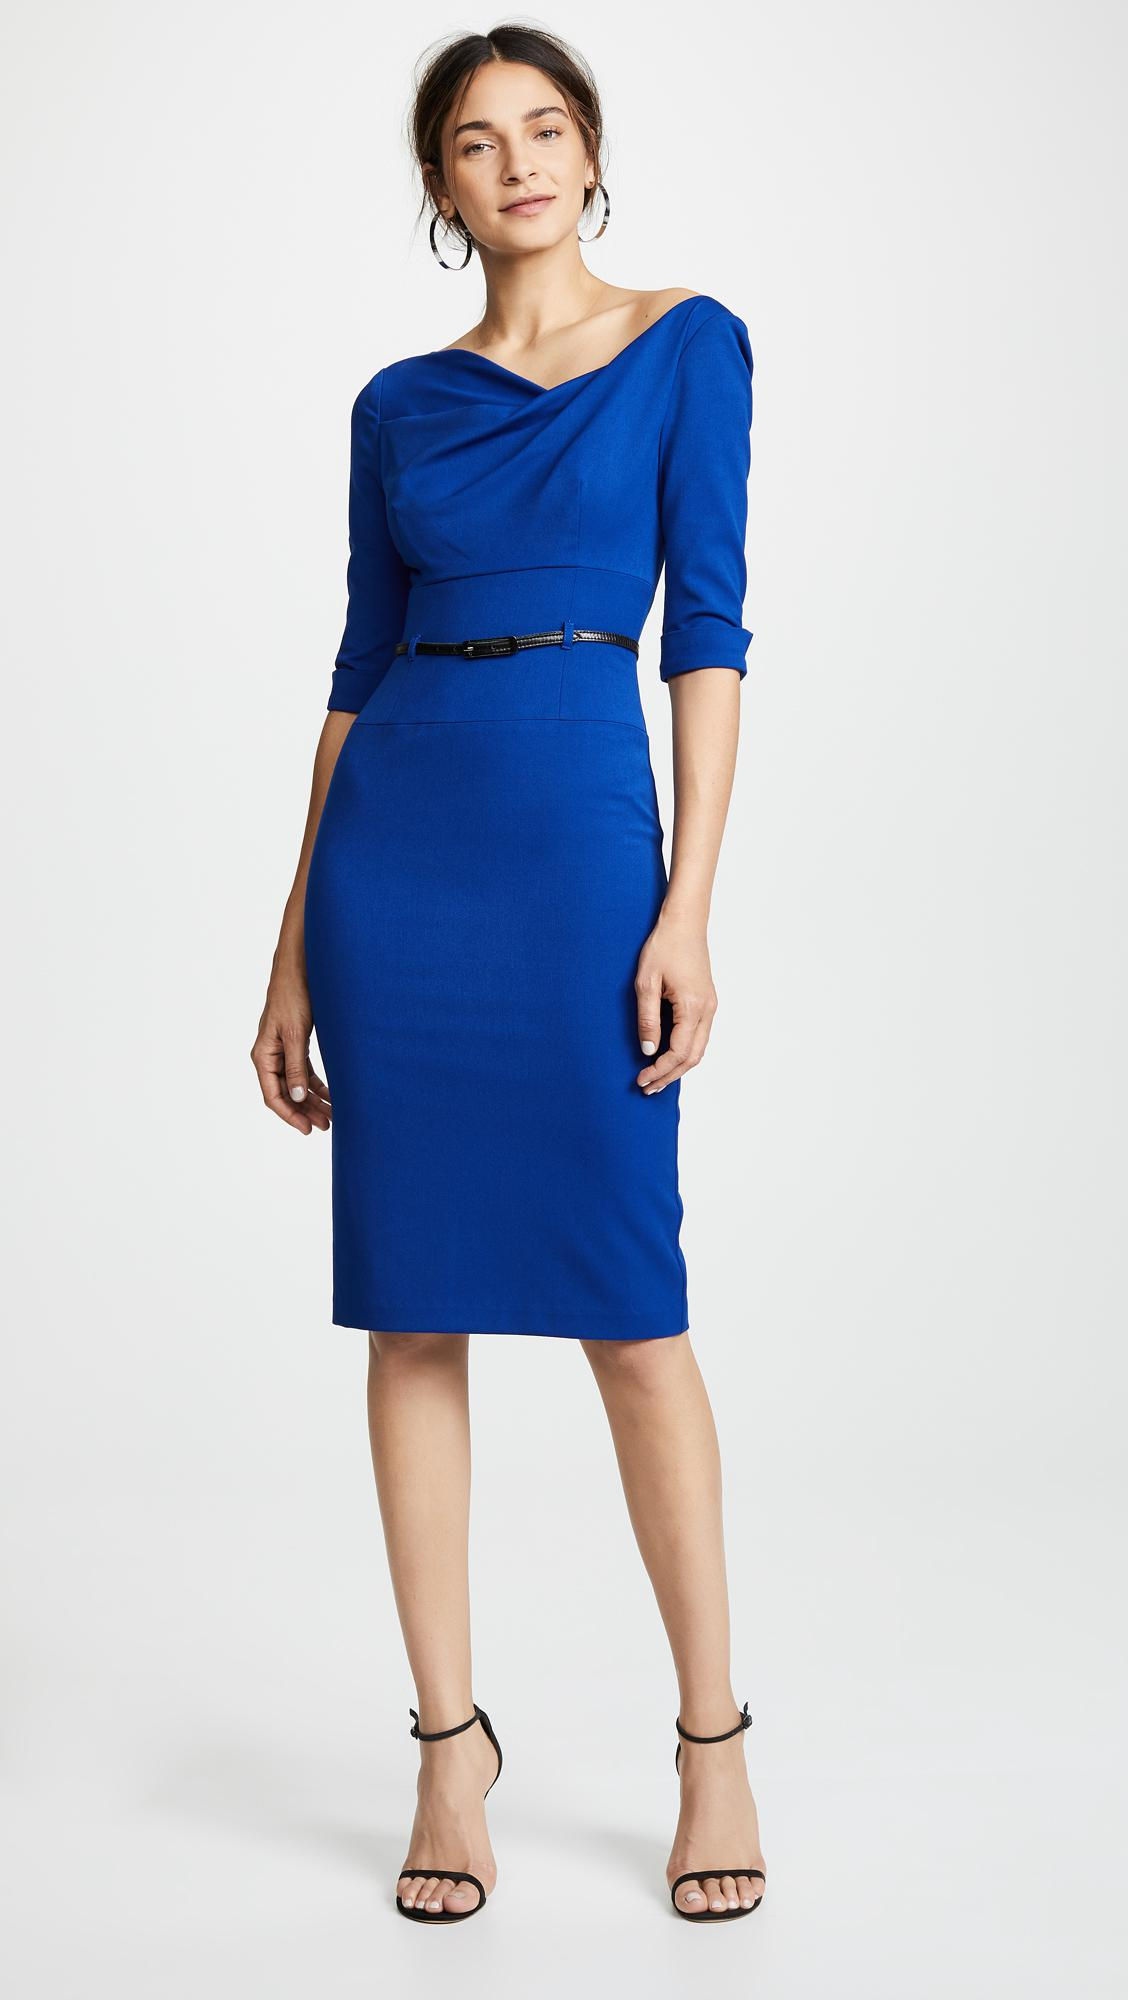 ea627e832a Black Halo 3 4 Sleeve Jackie O Dress in Blue - Lyst